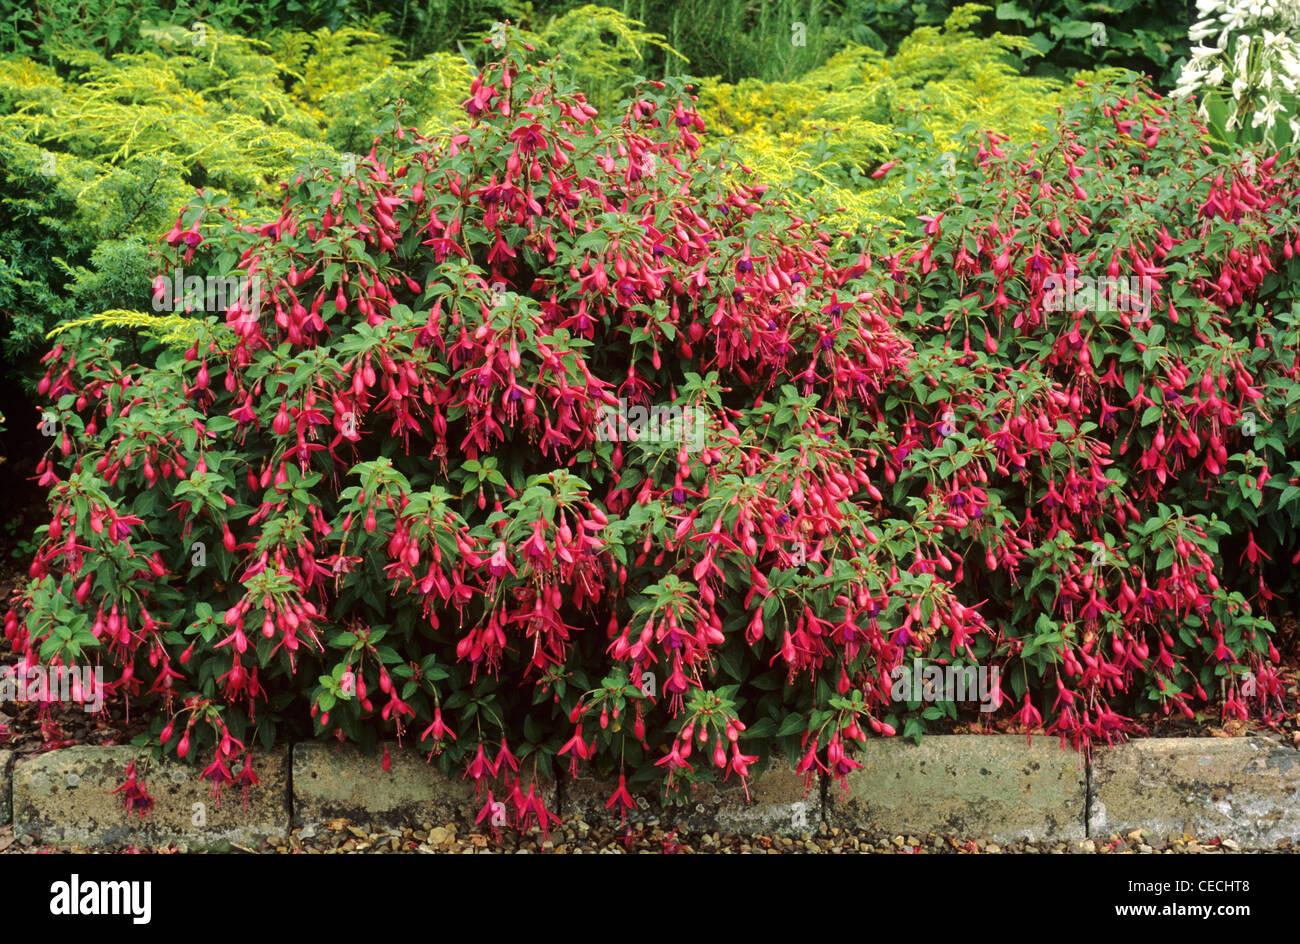 Fuchsia U0027Tom Thumbu0027, Border Edge Red Flower Flowers Fuchsias Garden Plant  Plants